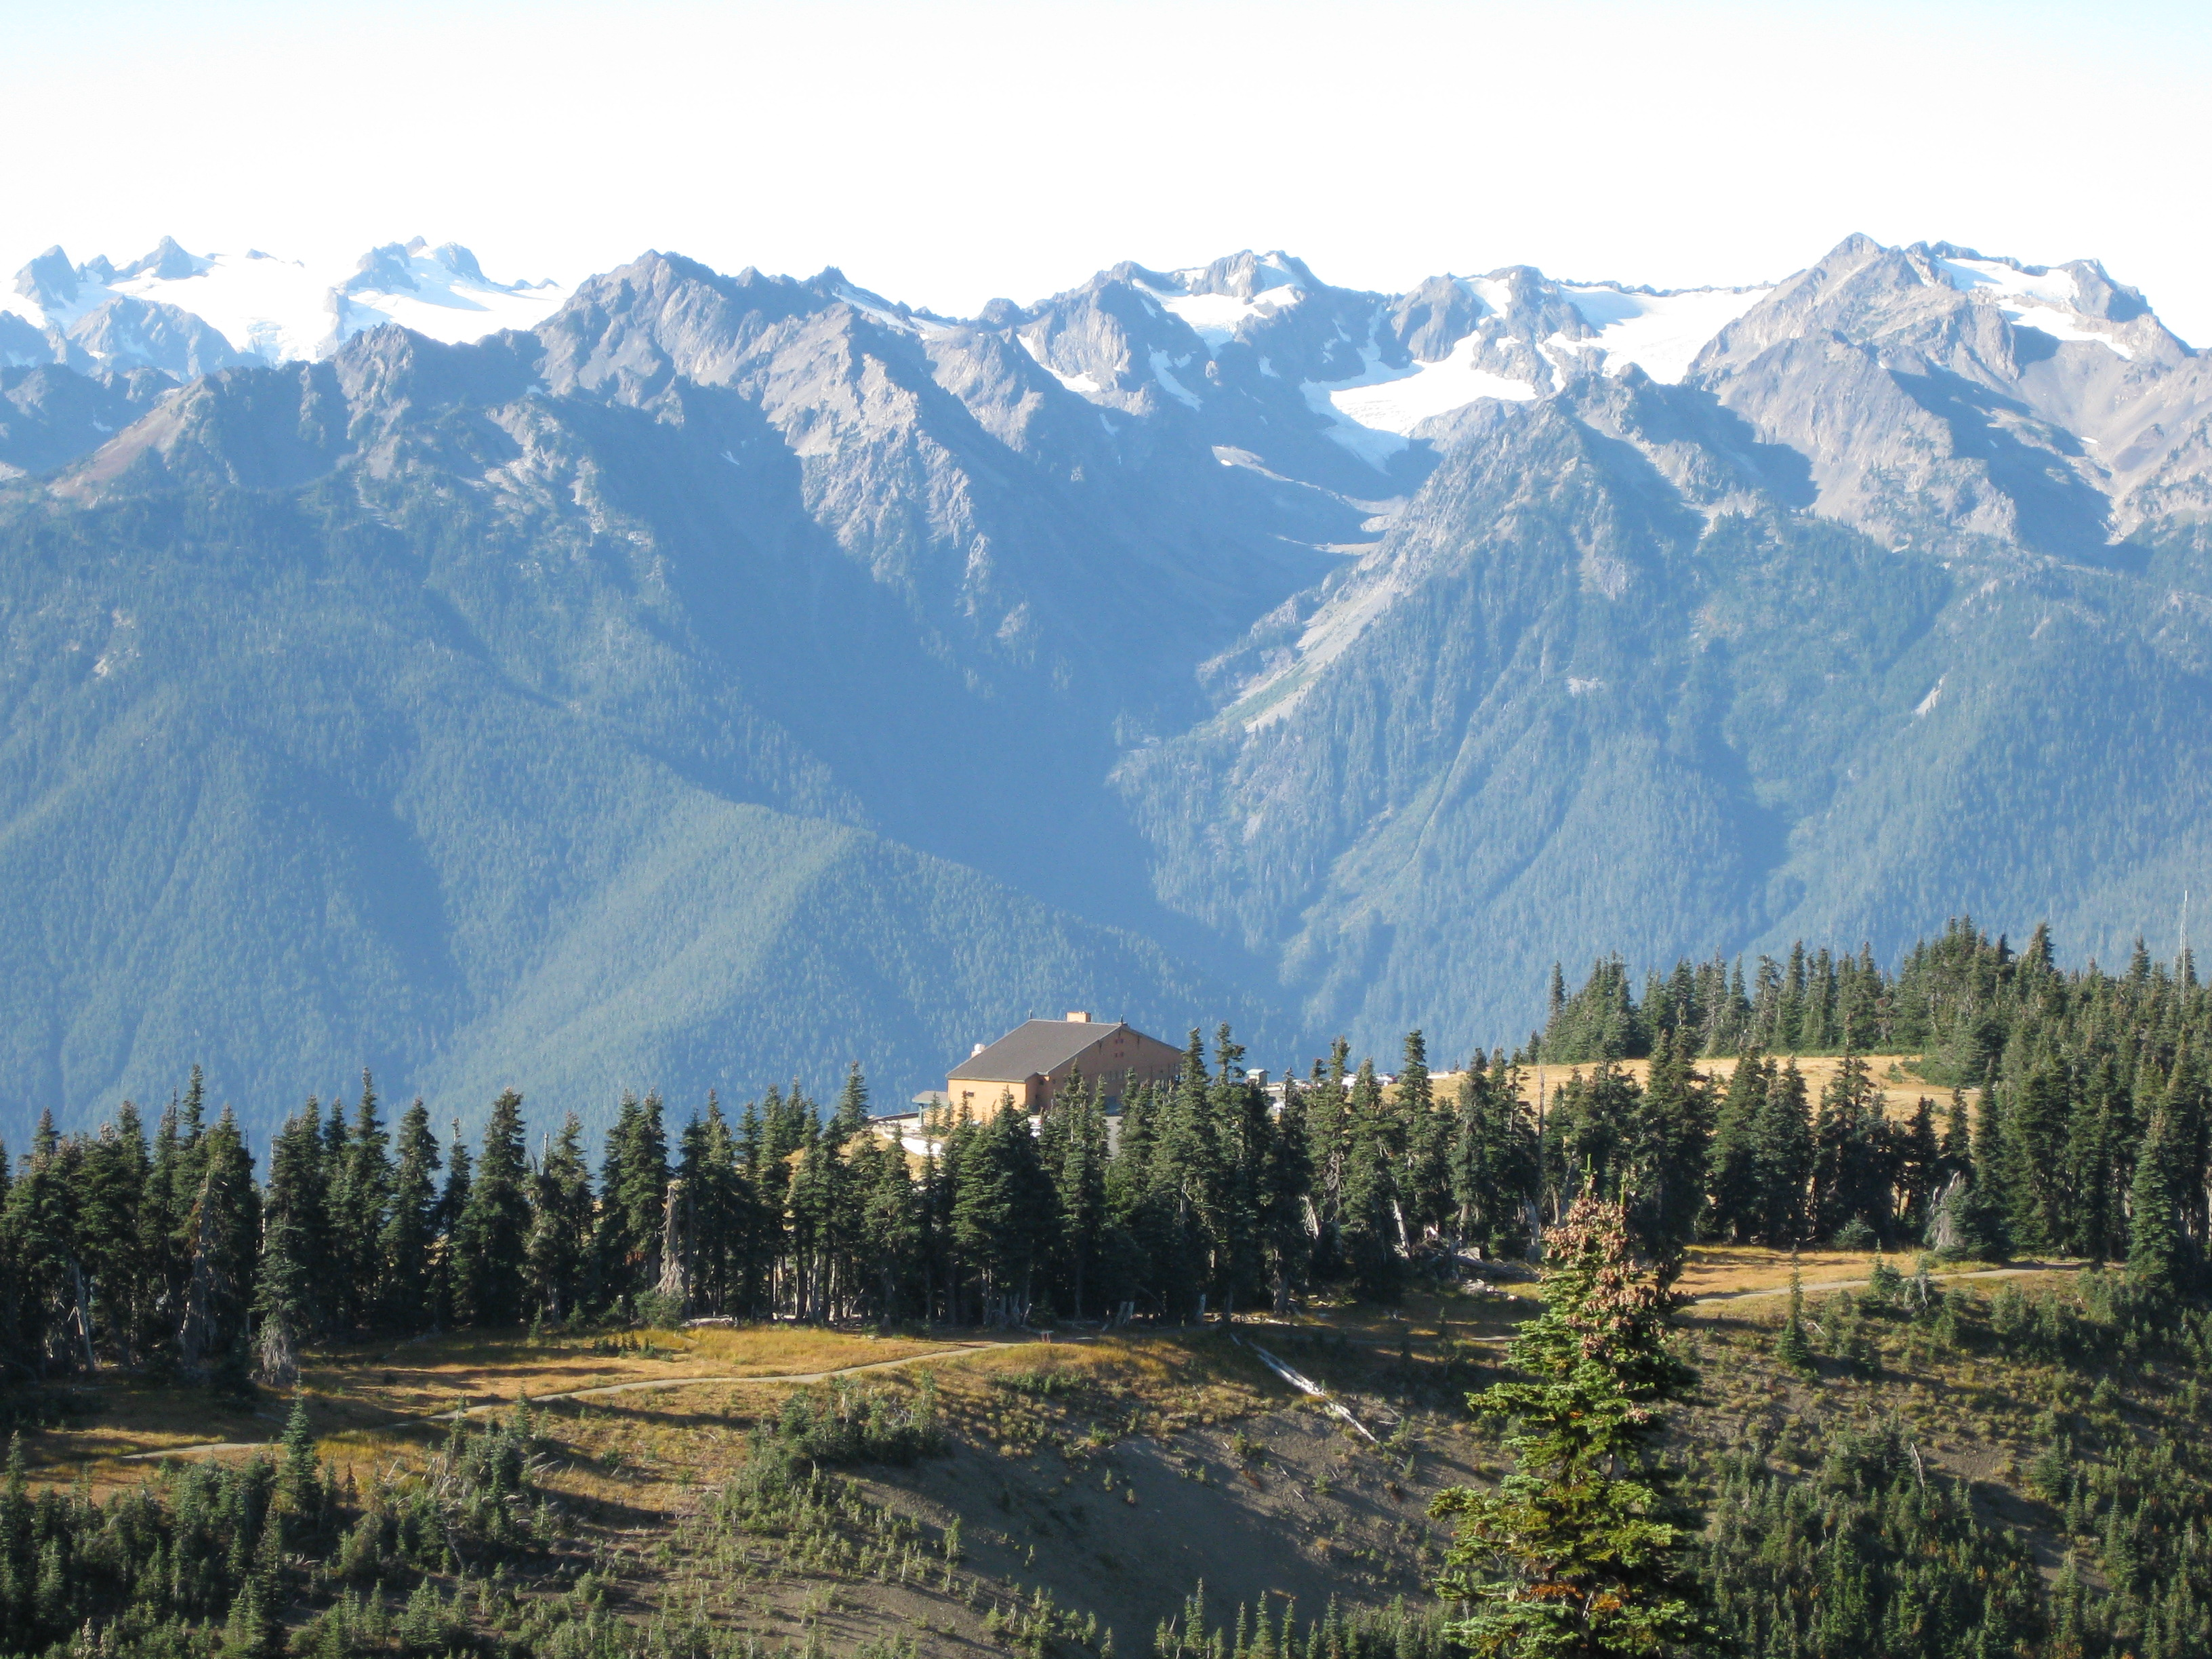 Olylmpics national park Washington